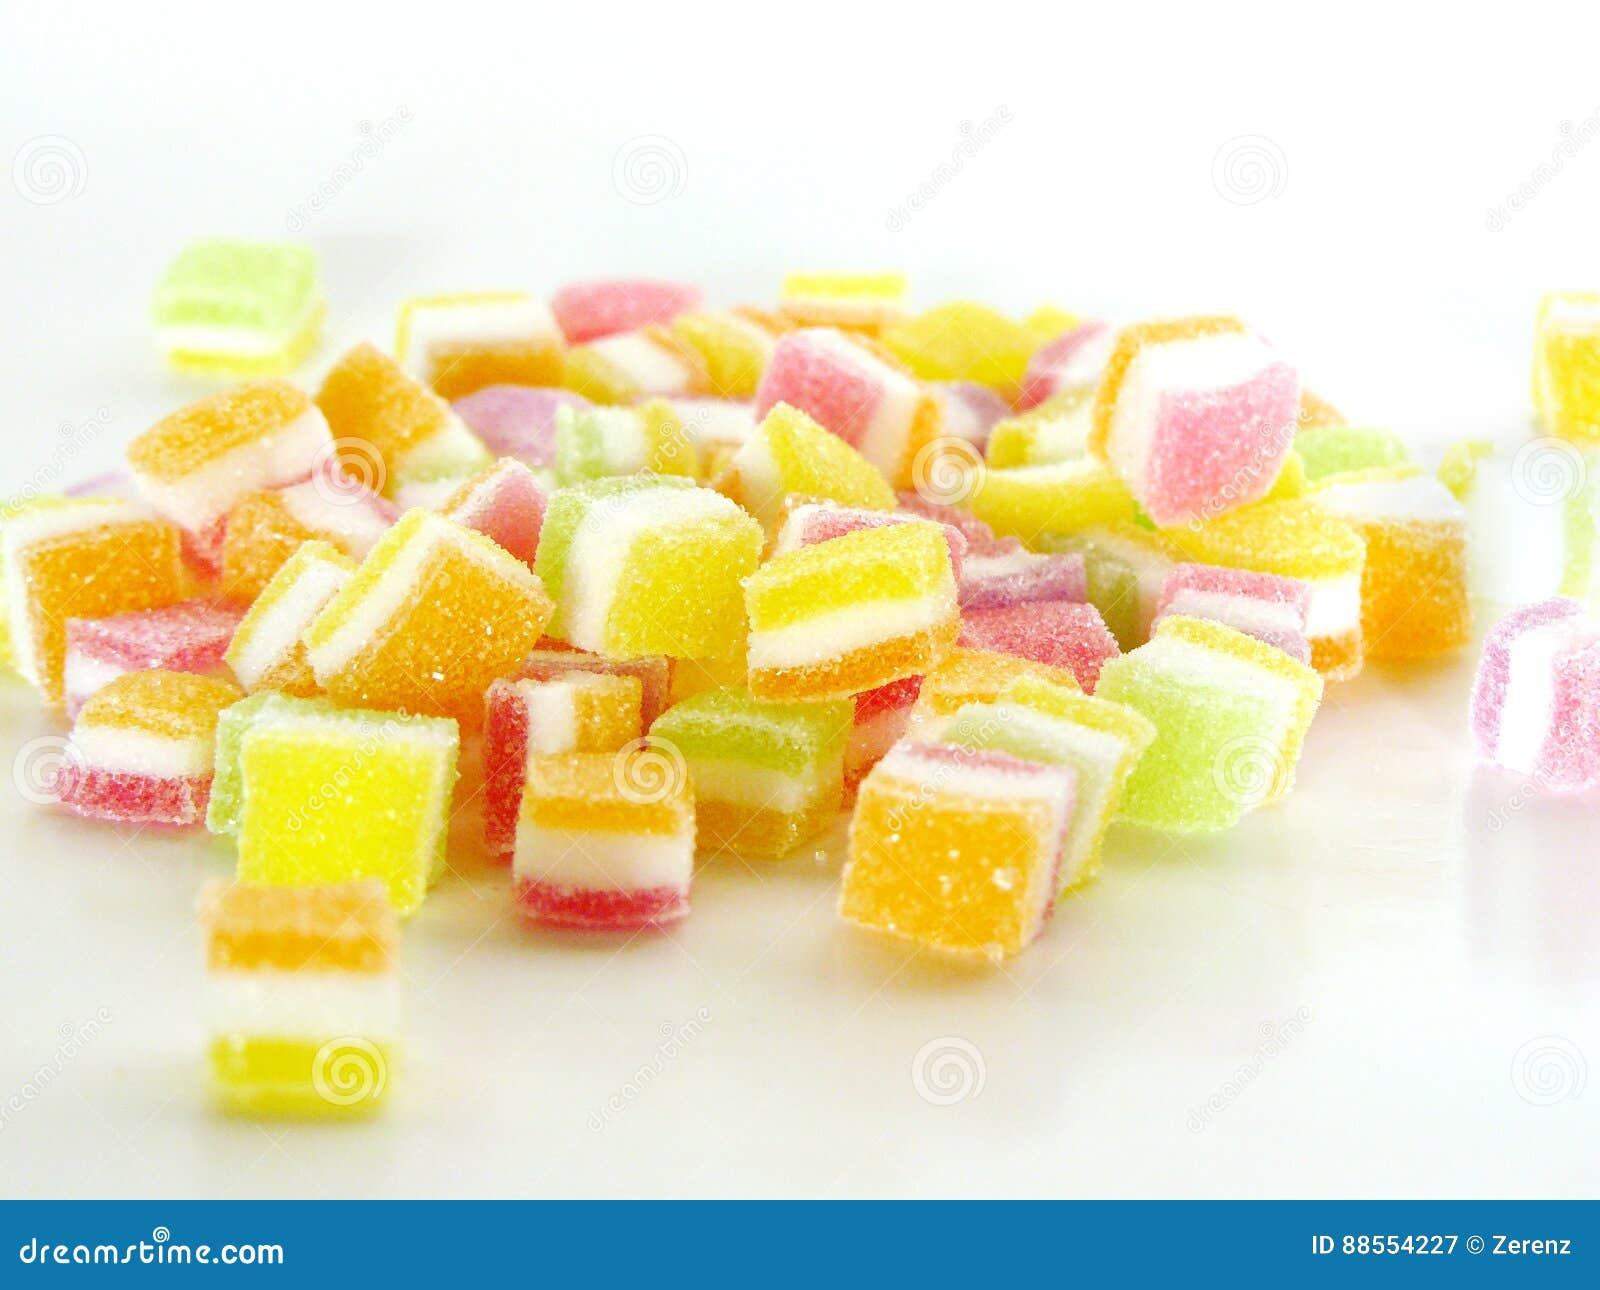 Cartoon Jelly Cake Recipe: Sweet Breakfast Pie Berry Jelly Royalty-Free Stock